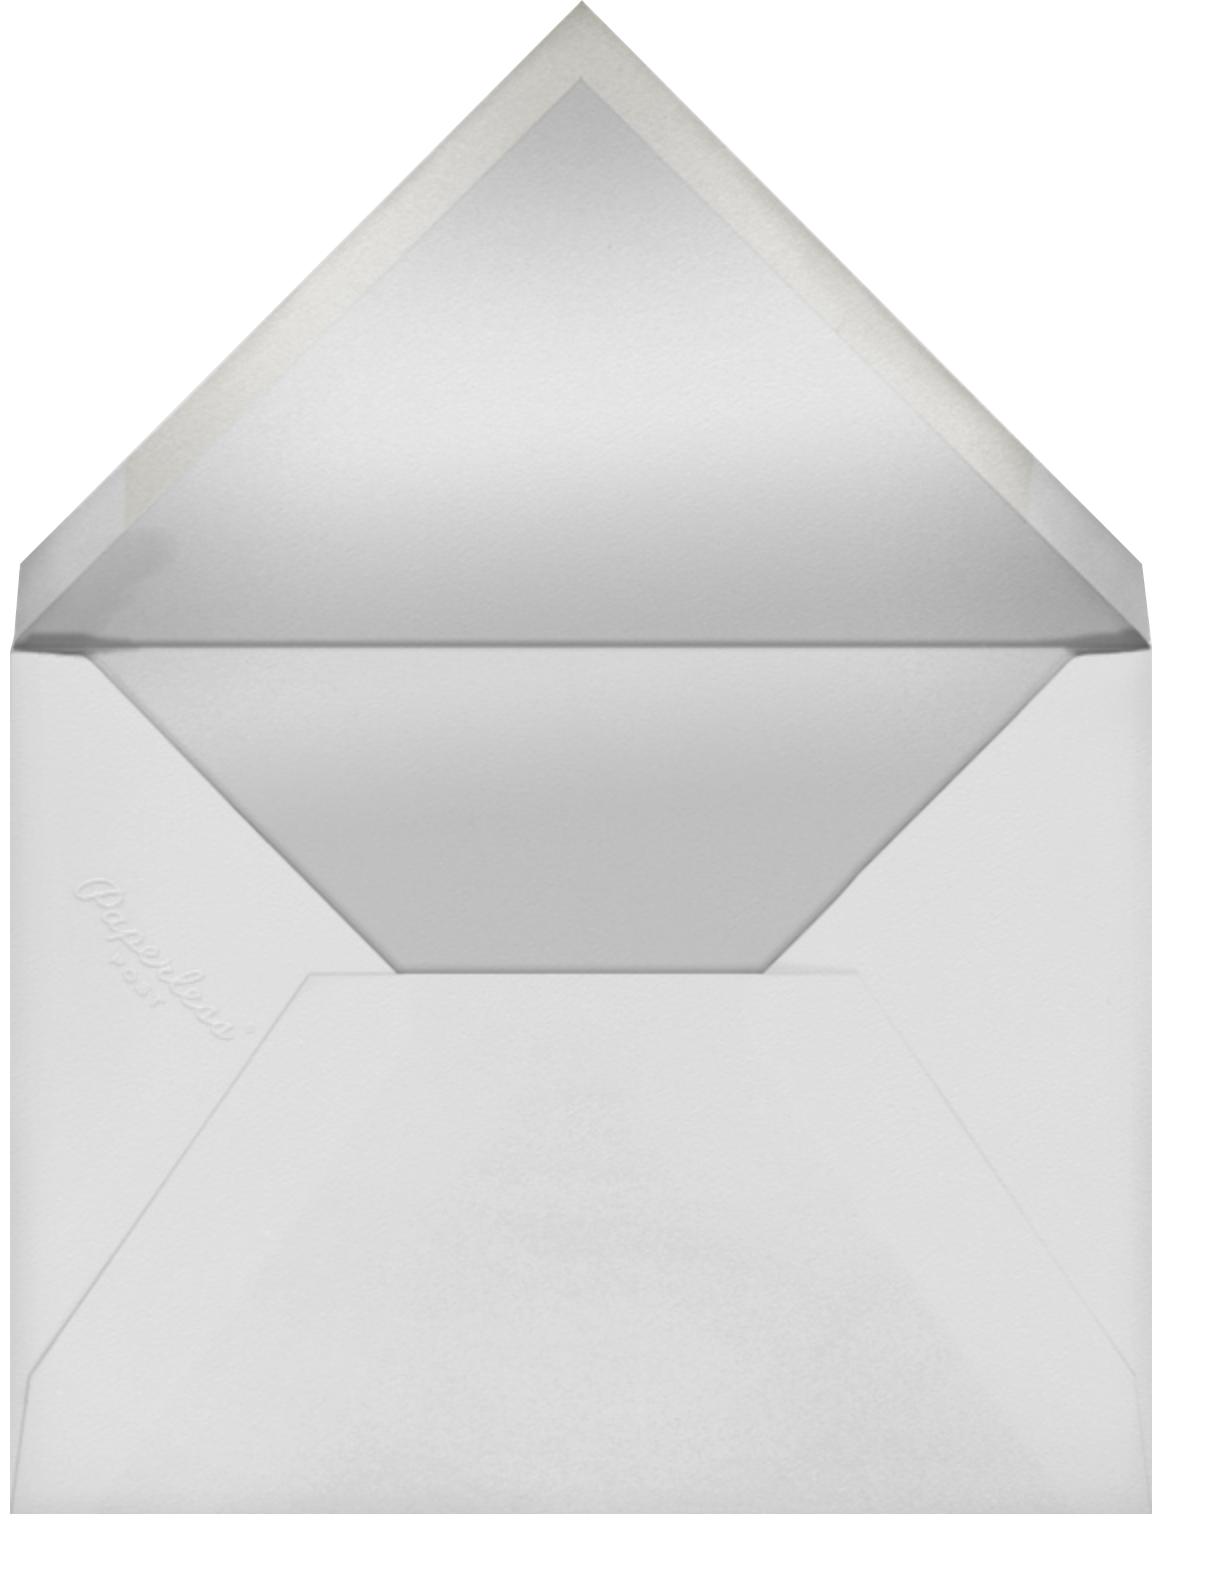 L'Heure Bleue (Menu) - Paperless Post - Menus - envelope back